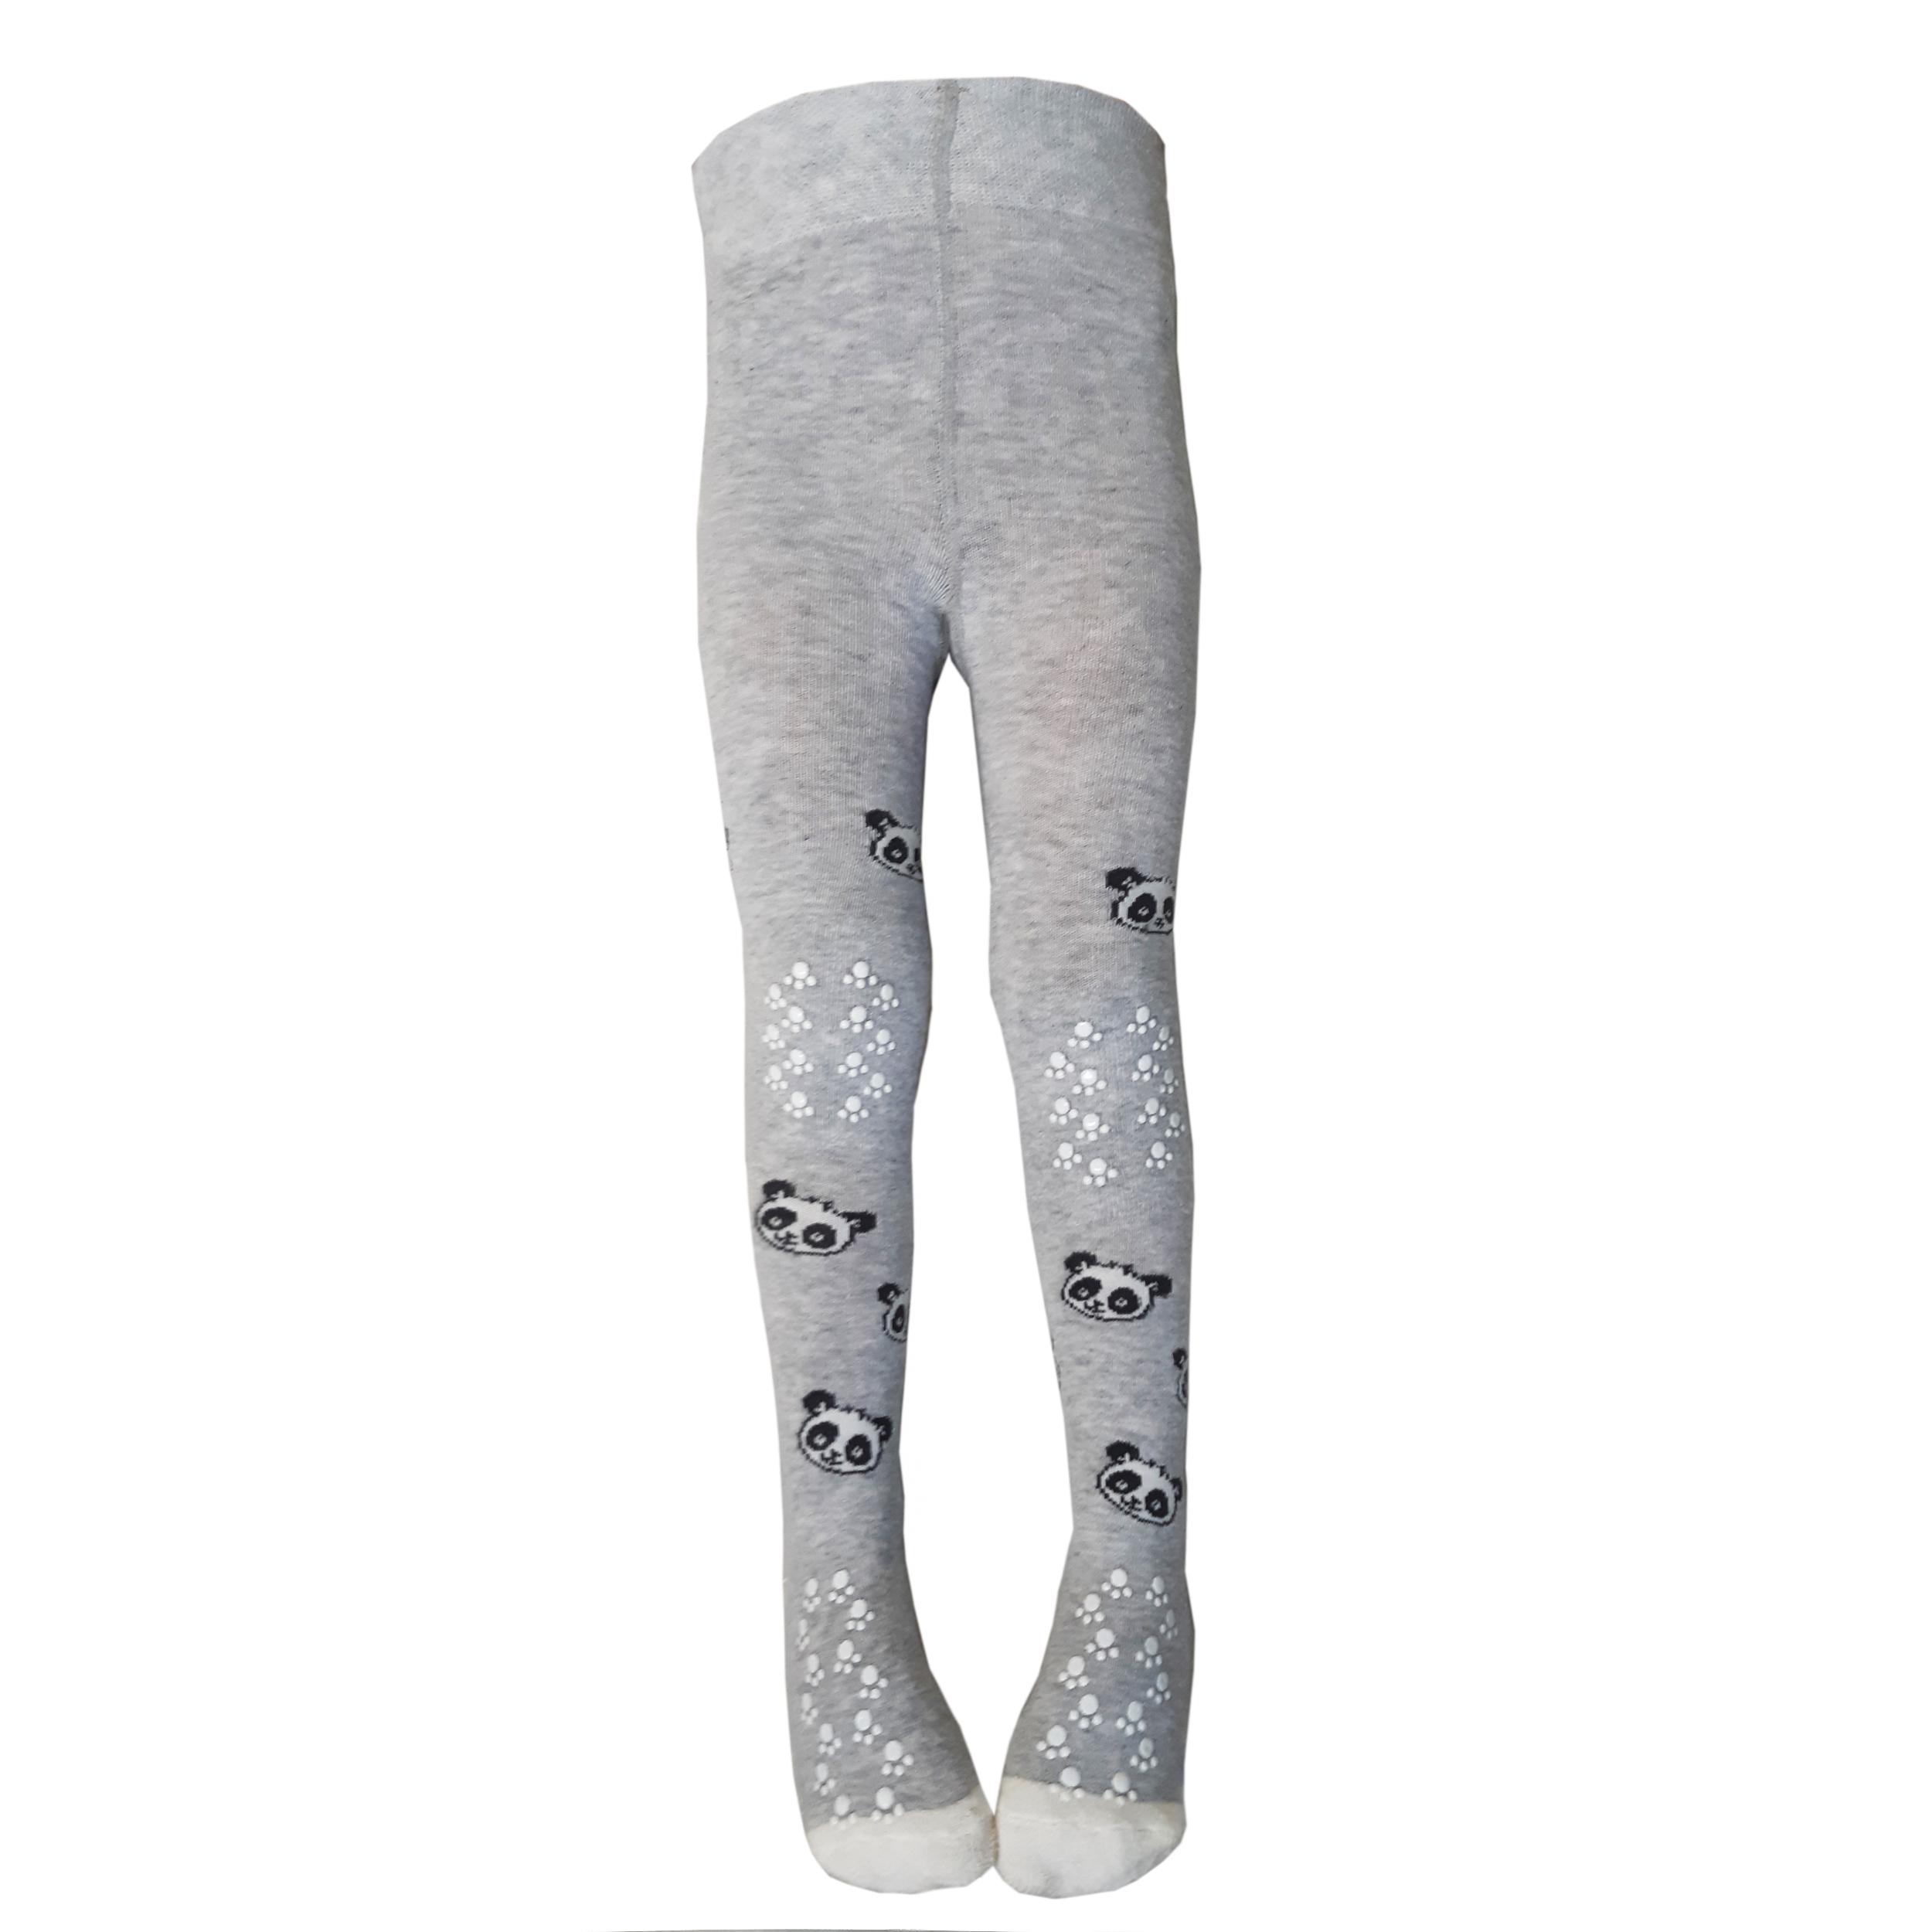 جوراب شلواری دخترانه لوپیلو مدل s01